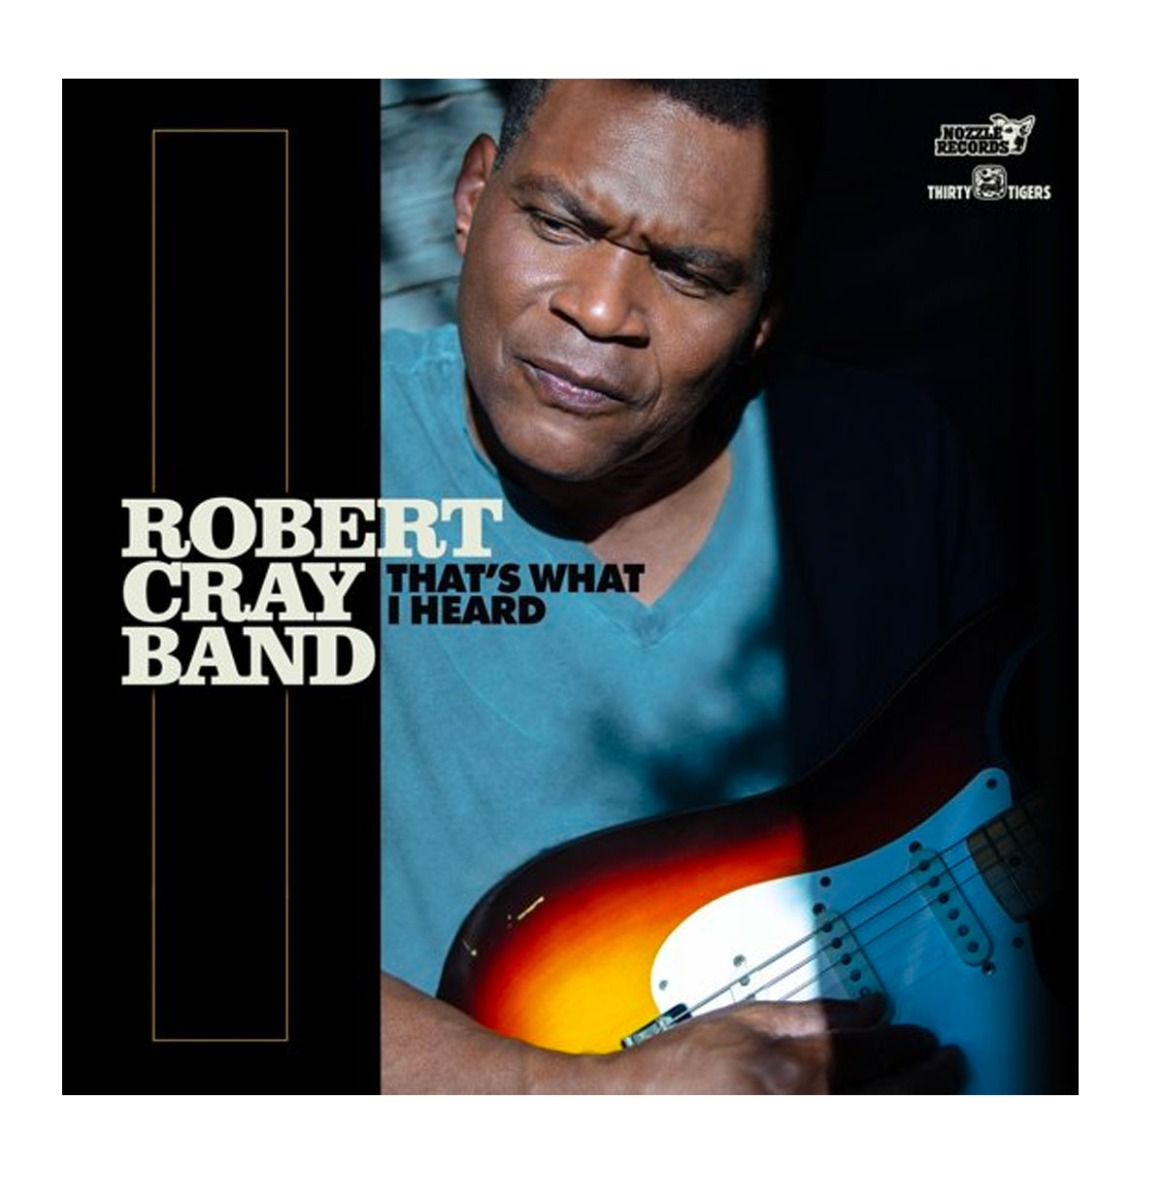 Robert Cray Band - That's What I Heard LP